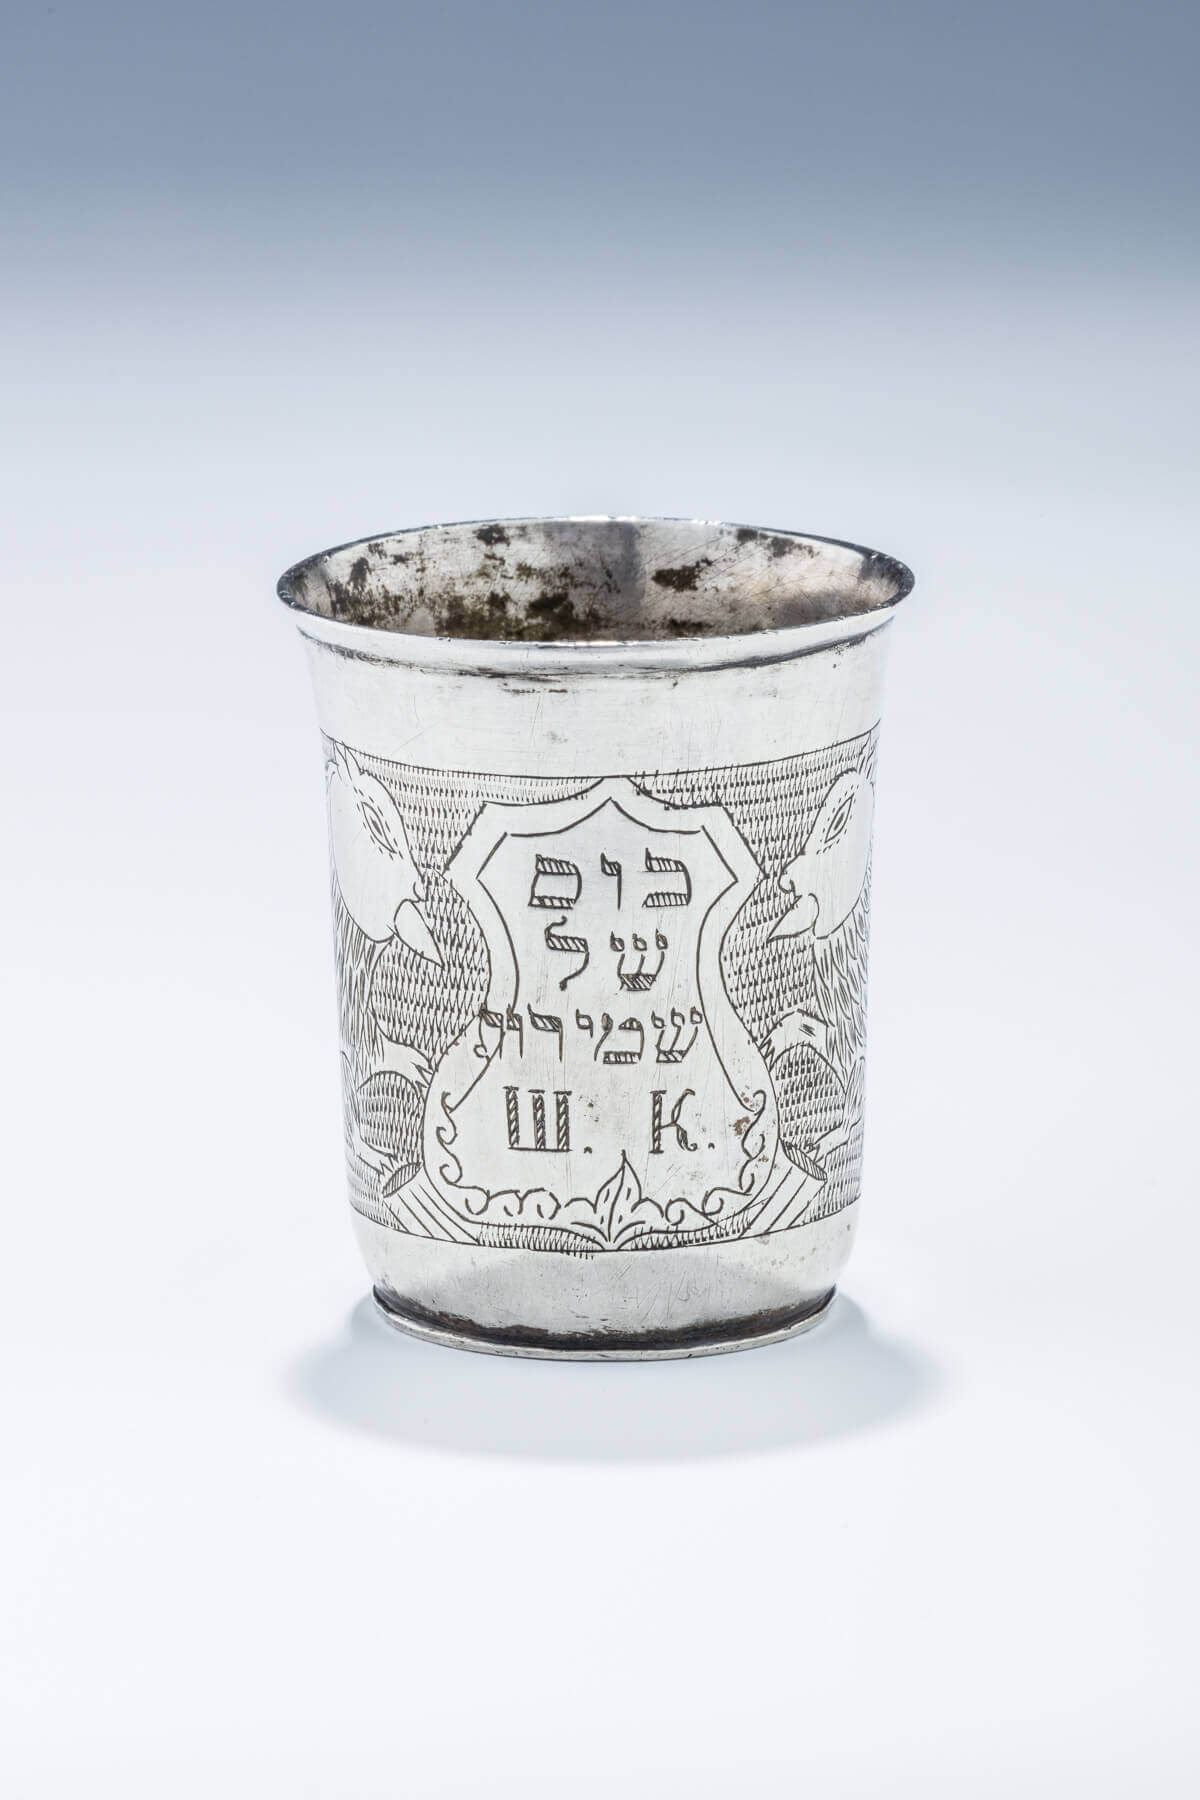 057. A SILVER SHMIROT KIDDUSH CUP